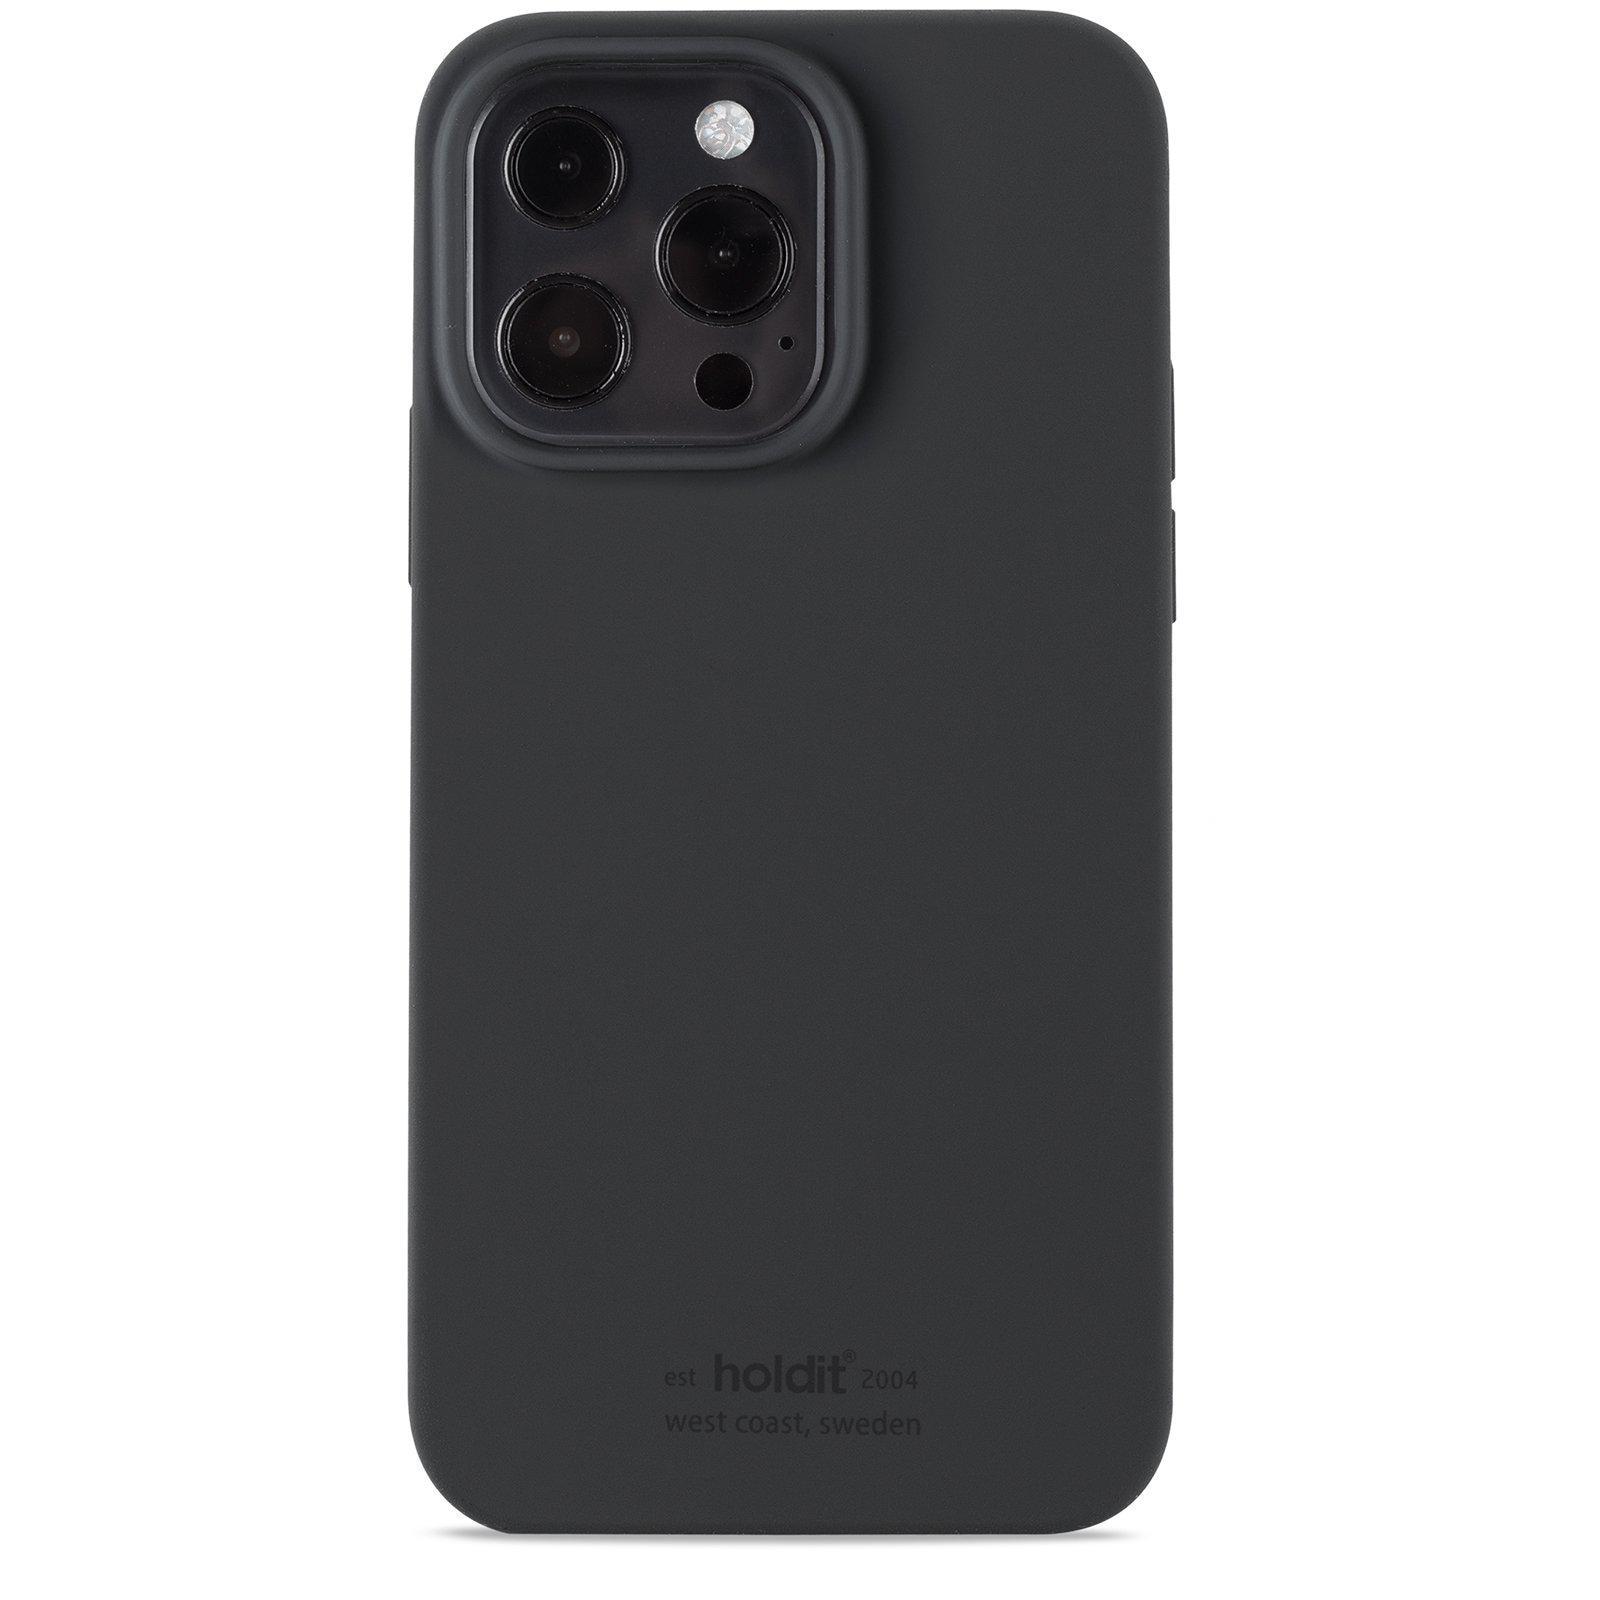 Silikonskal iPhone 13 Pro Black